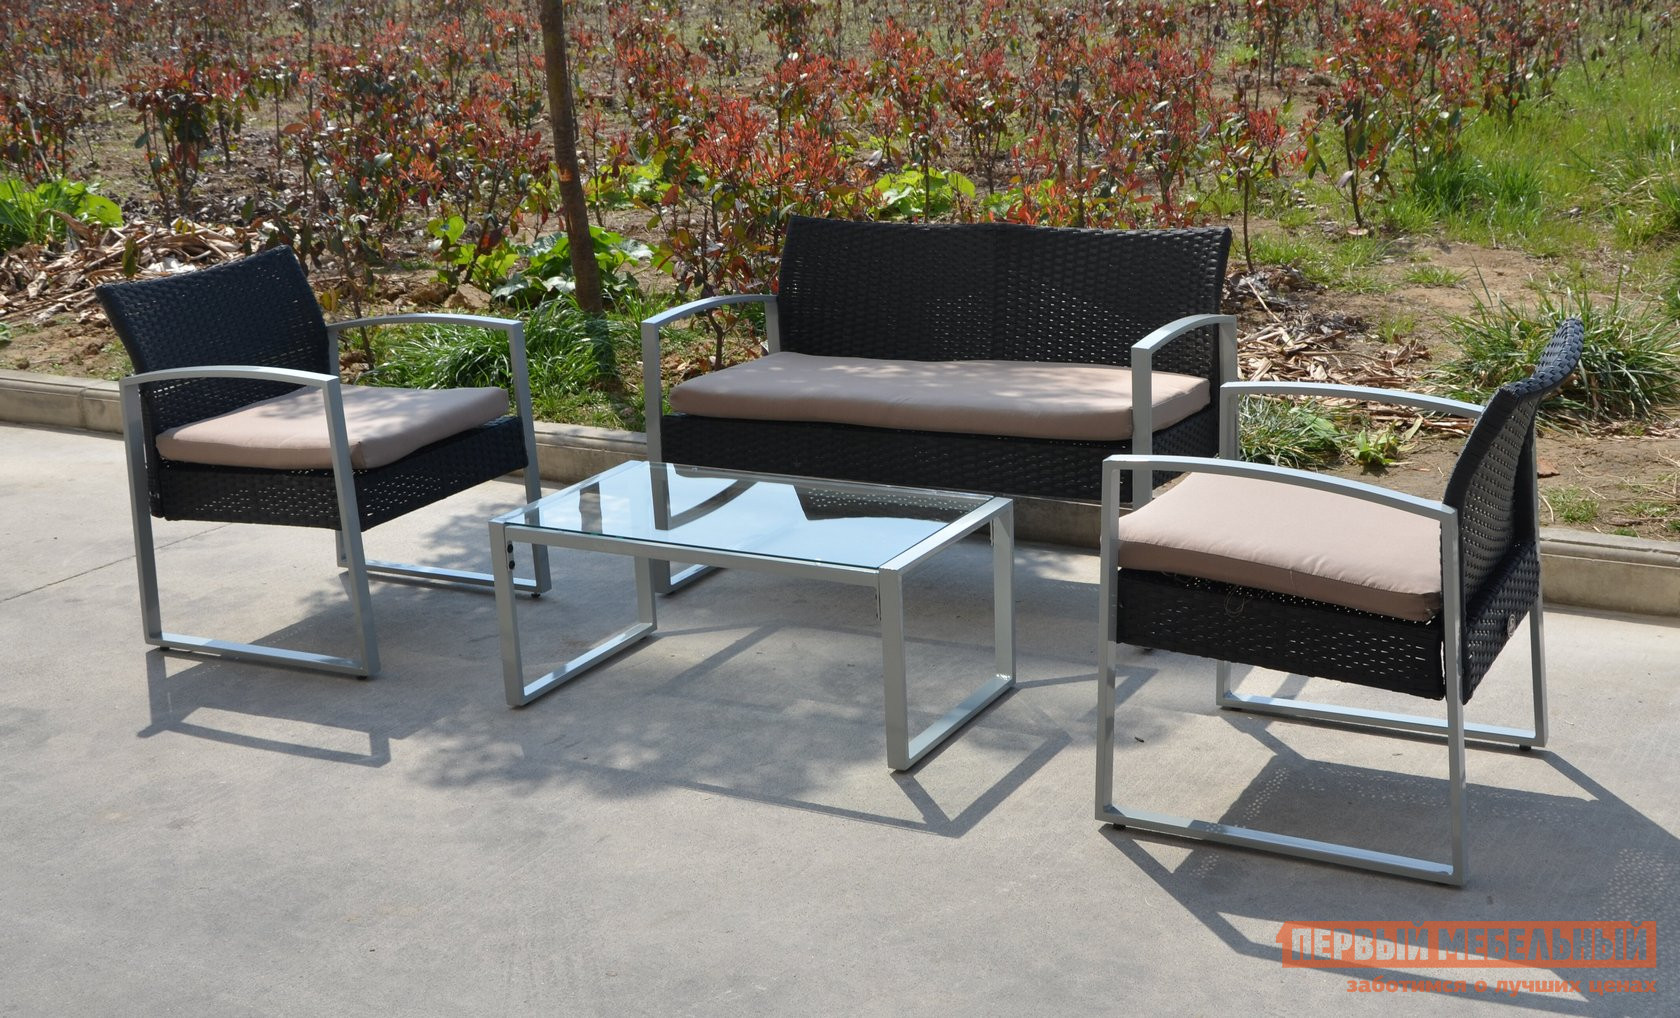 Комплект плетеной мебели Kvimol KM-0314